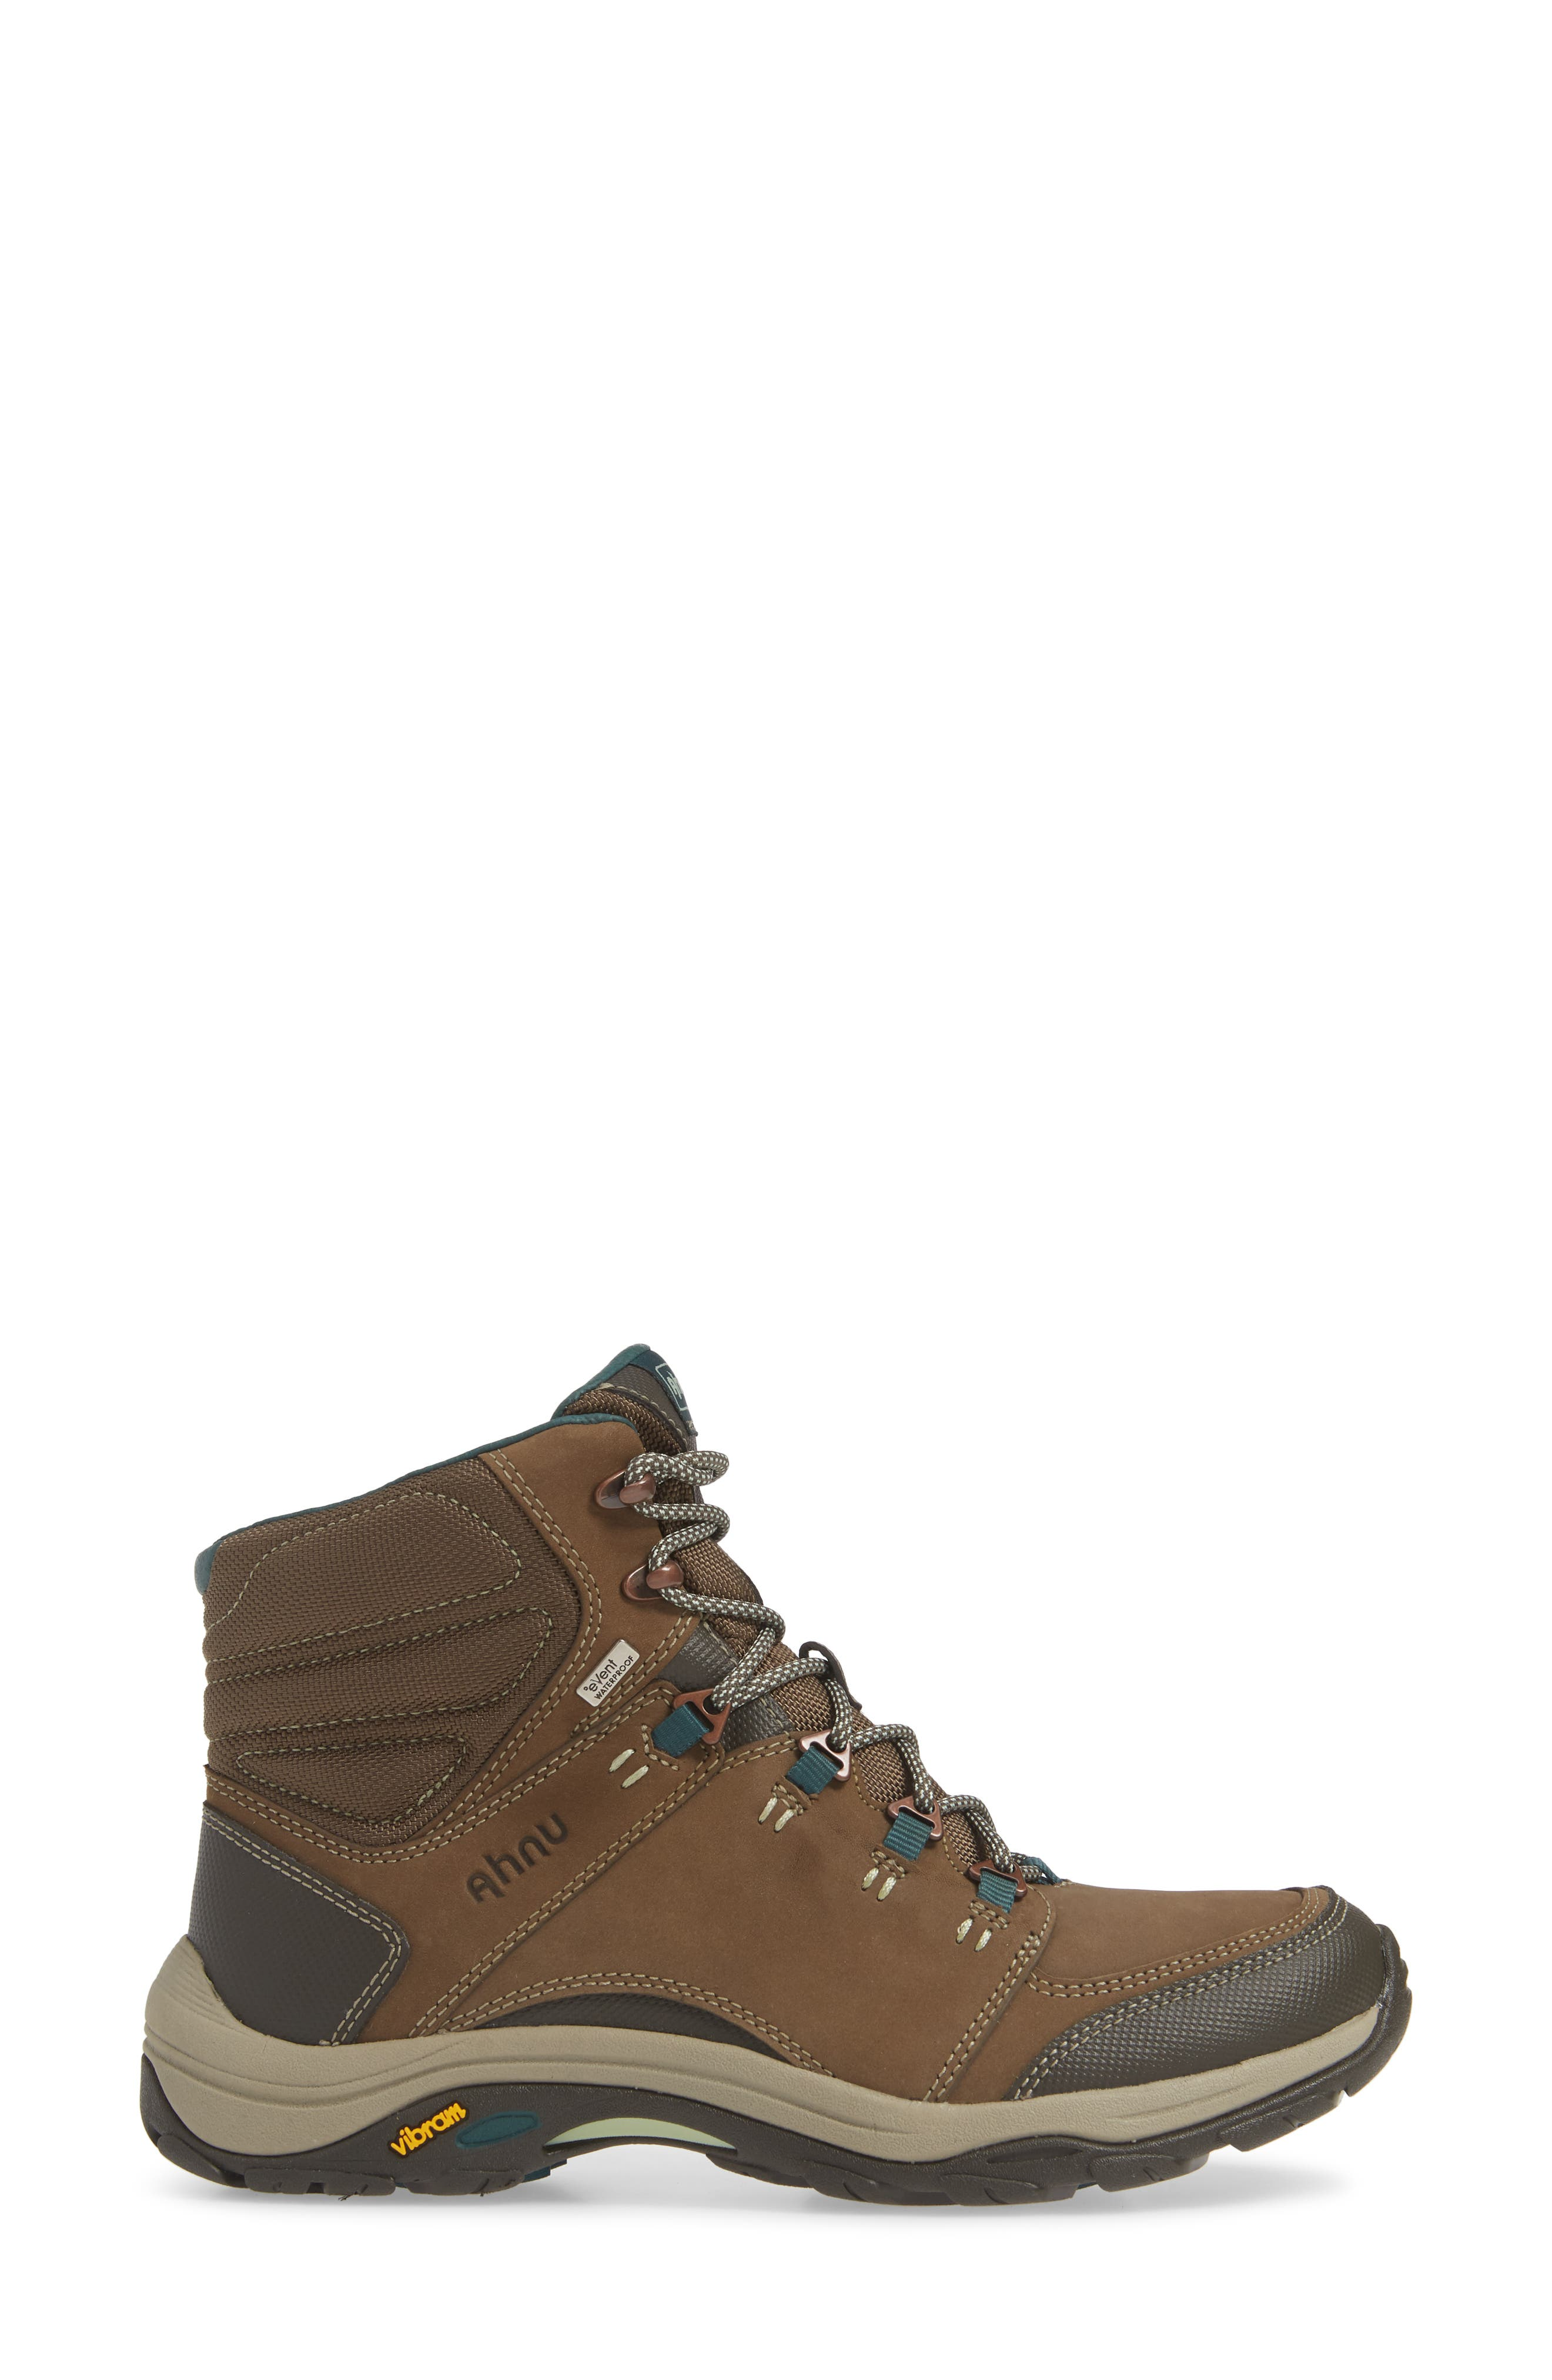 Ahnu by Teva Montara III Waterproof Hiking Boot,                             Alternate thumbnail 3, color,                             CHOCOLATE CHIP NUBUCK LEATHER